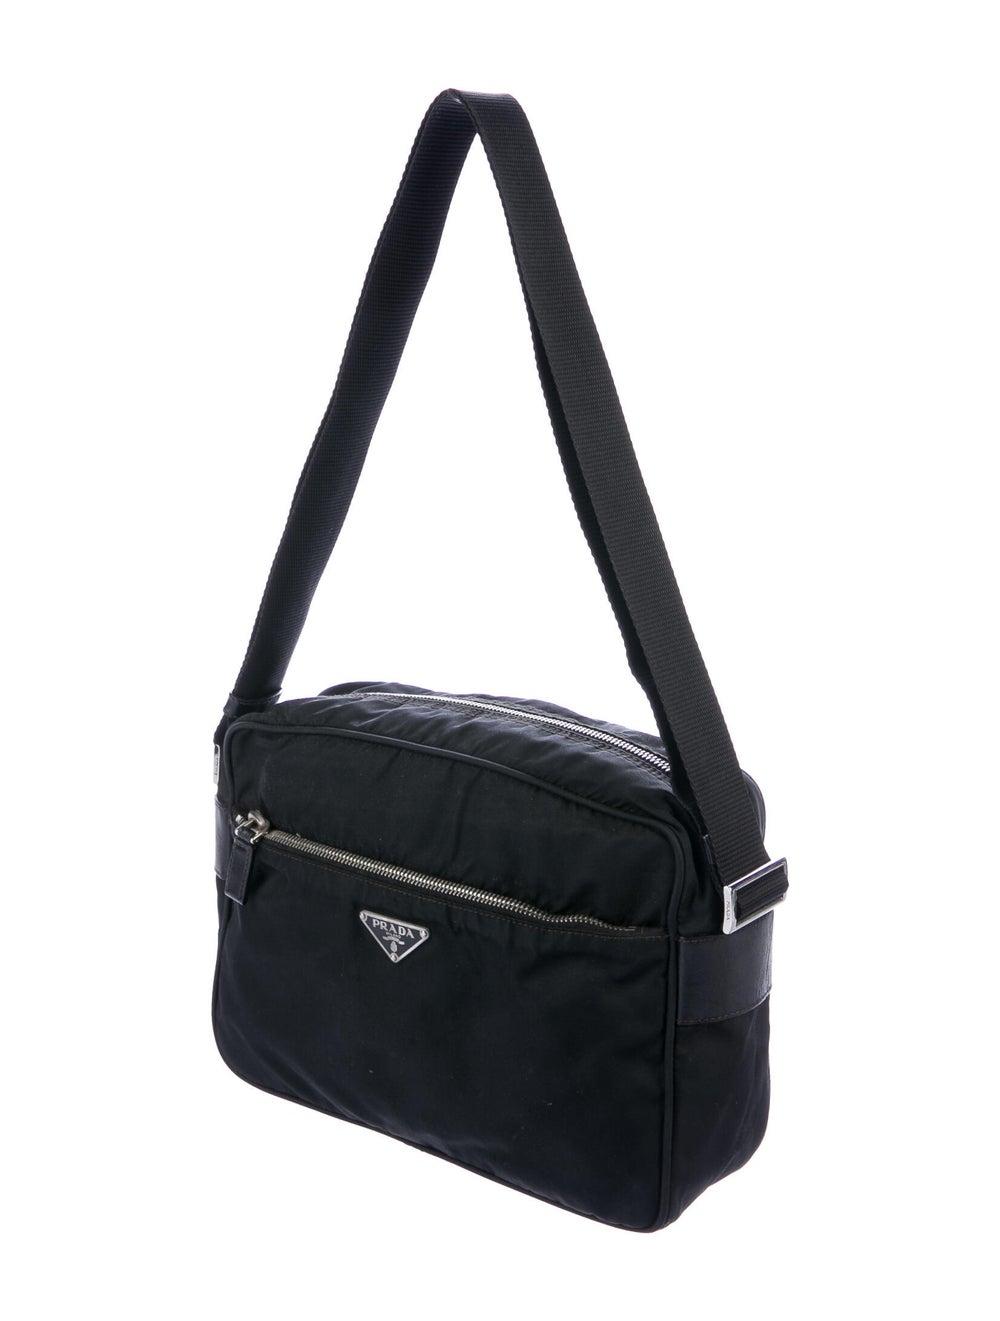 Prada Tessuto Crossbody Bag Black - image 3